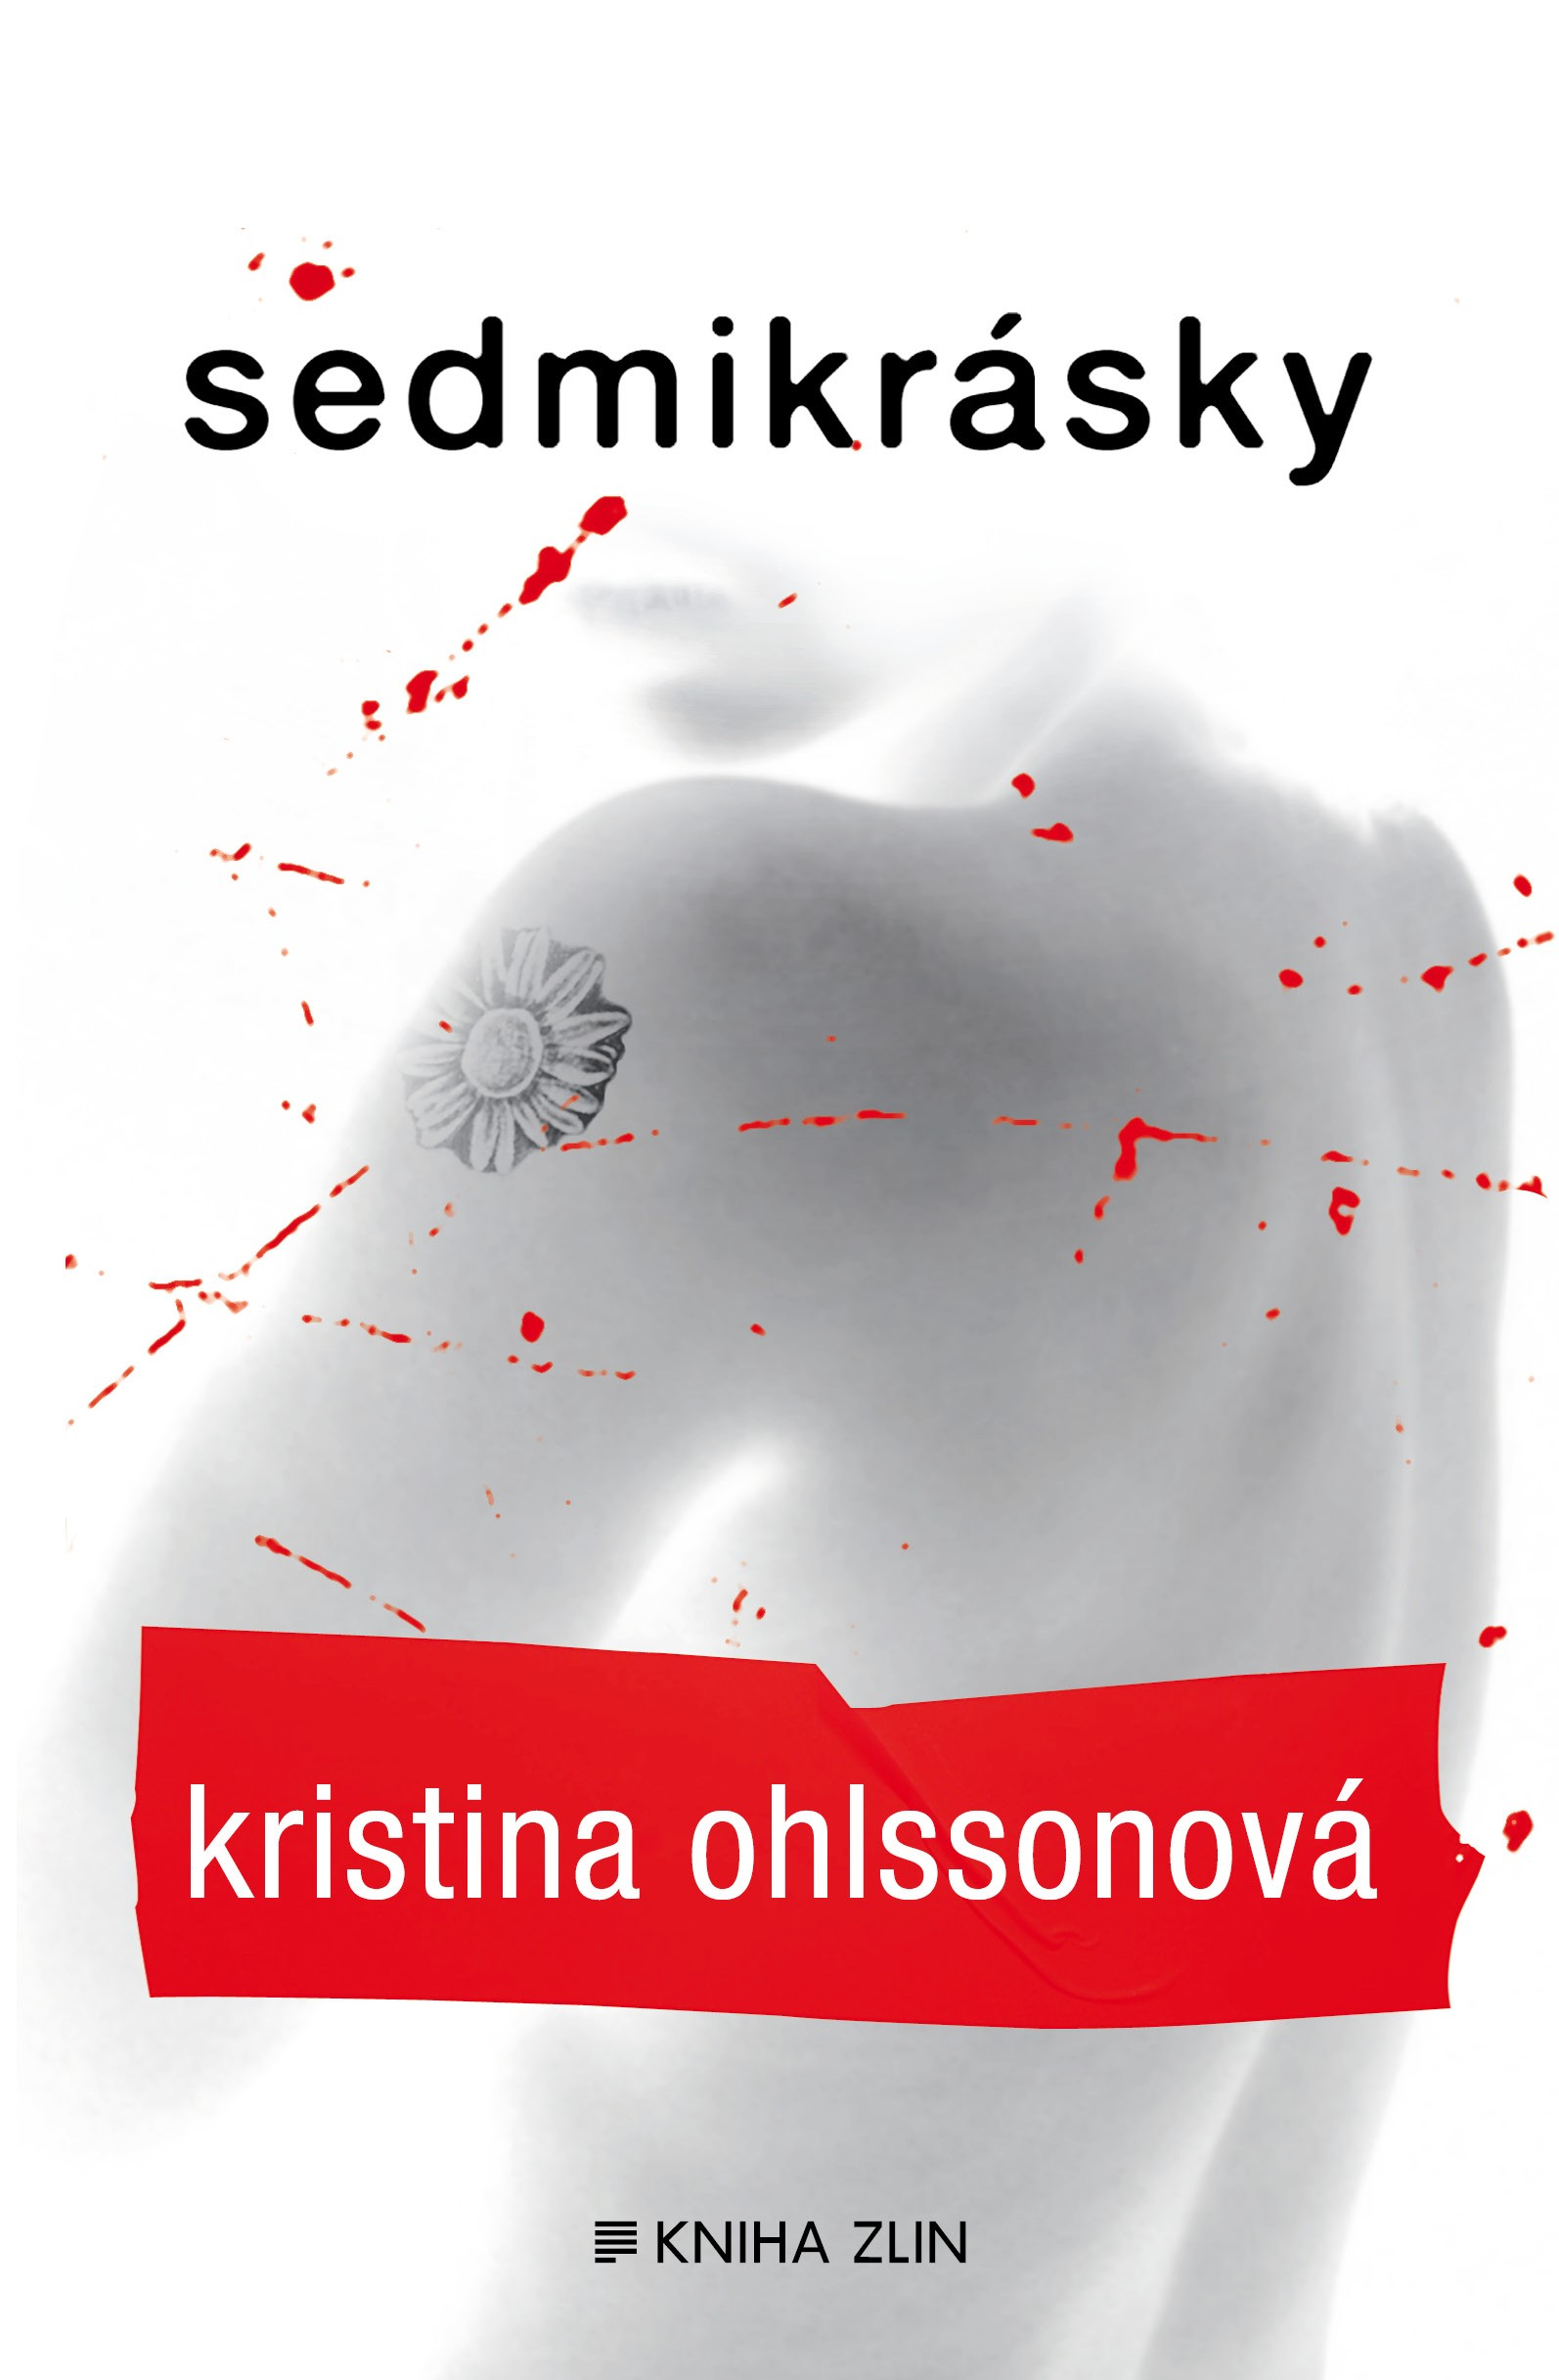 Sedmikrásky | Kristina Ohlssonová, Luisa Robovská